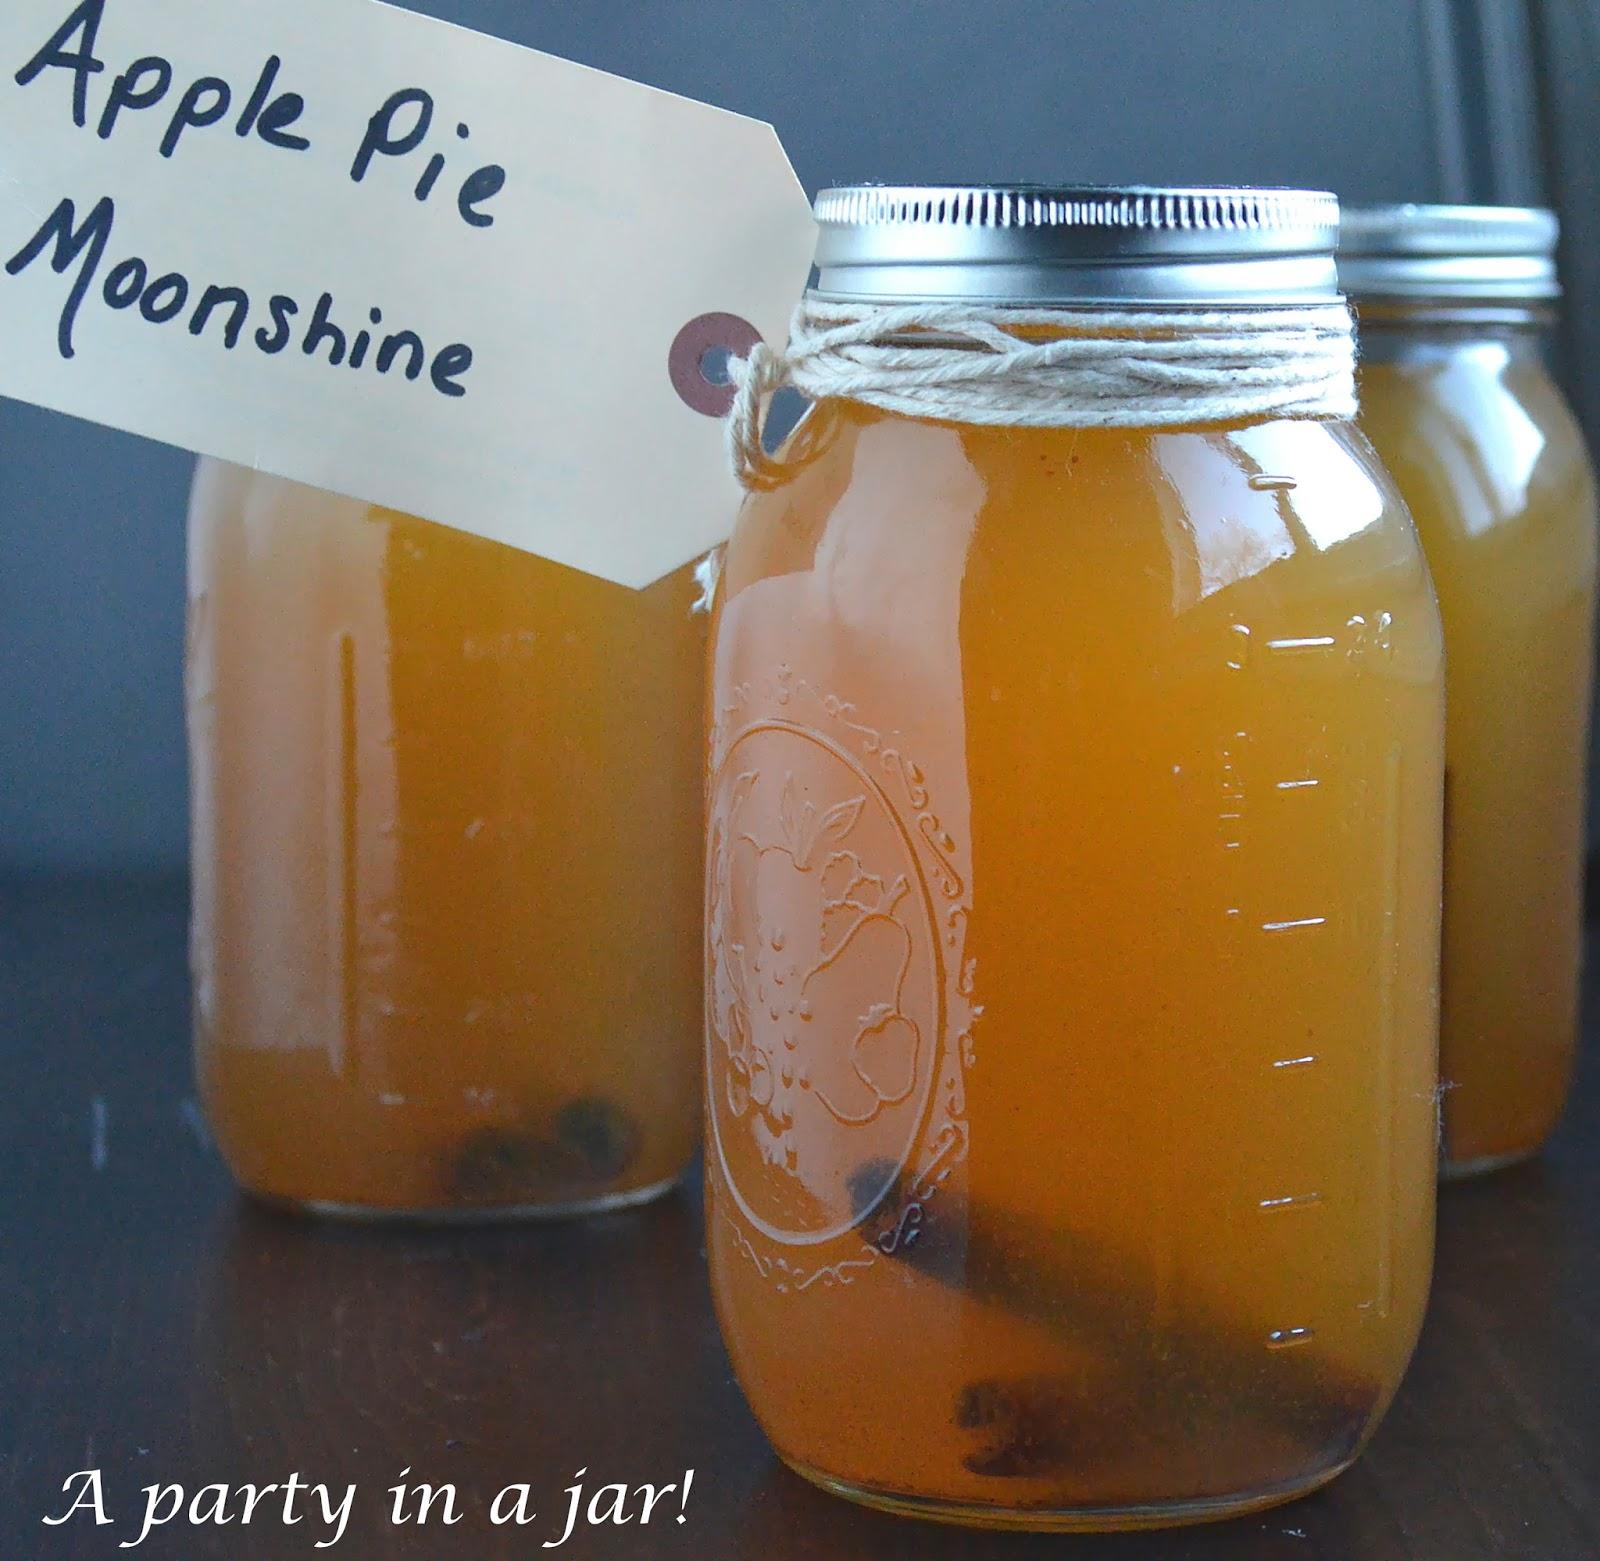 Apple pie moonshine souffle bombay apple pie moonshine forumfinder Choice Image